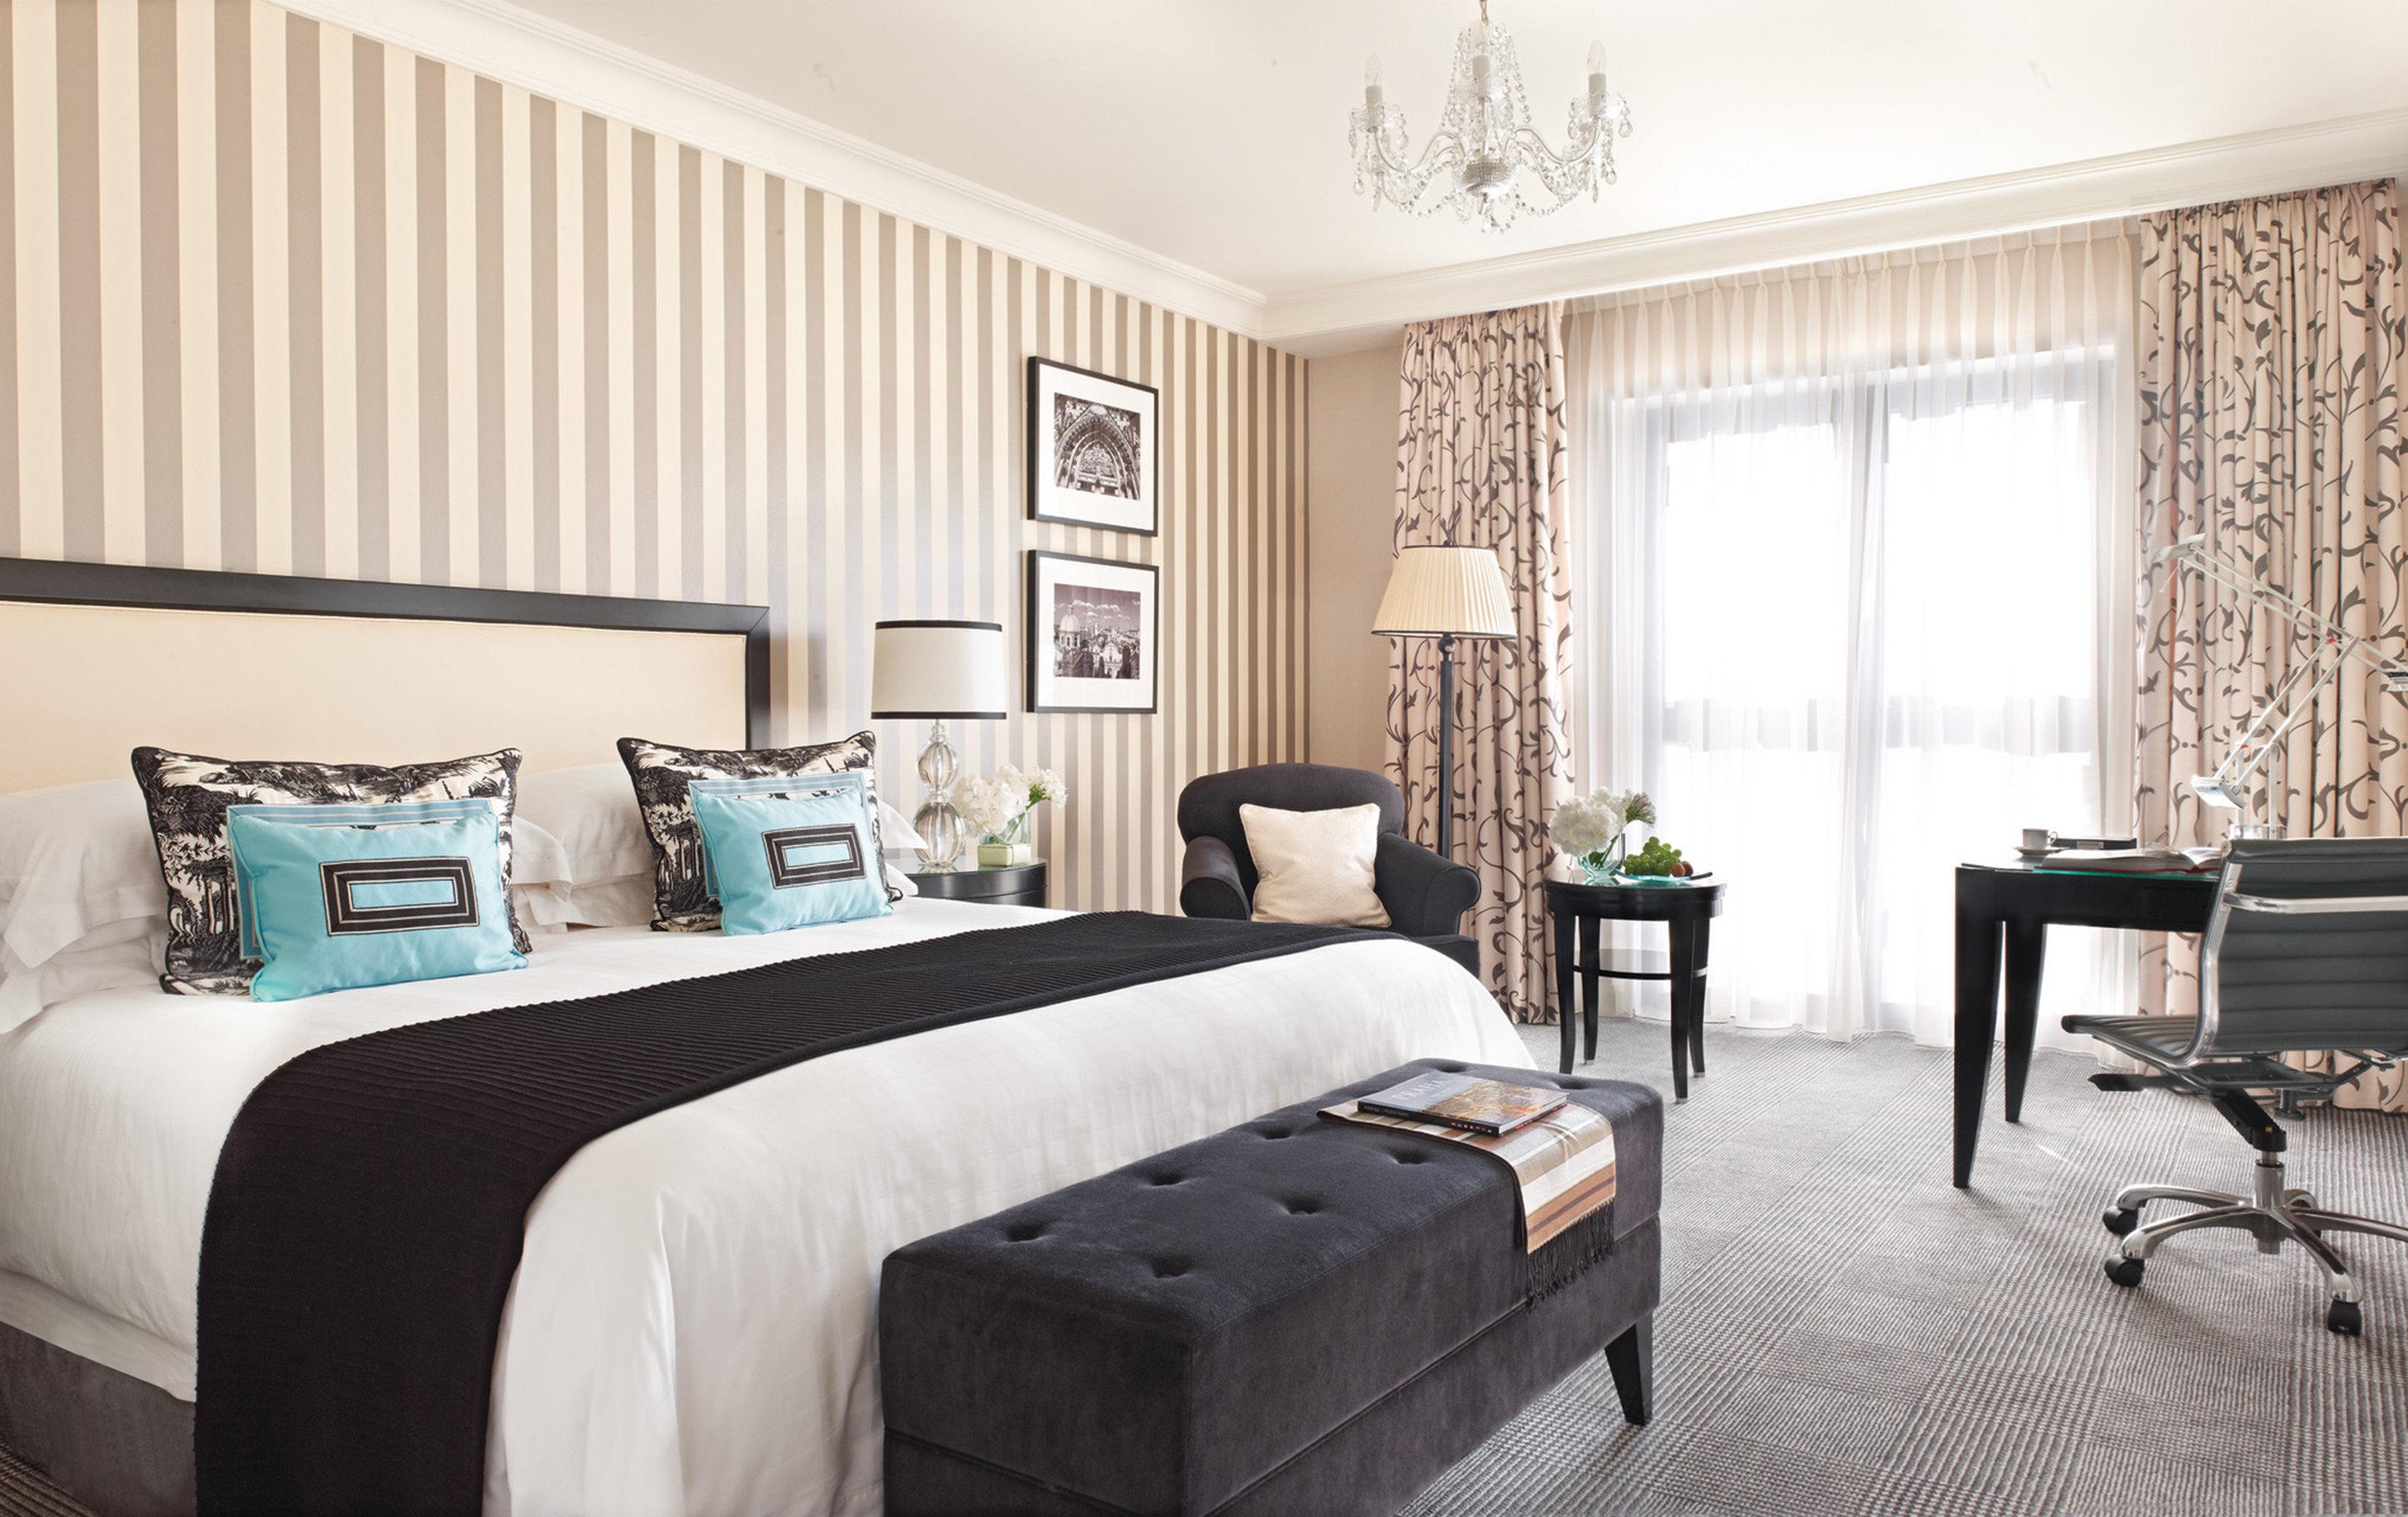 Bedroom Hip Lounge Luxury Modern Romantic Suite sofa property living room home condominium cottage bed sheet